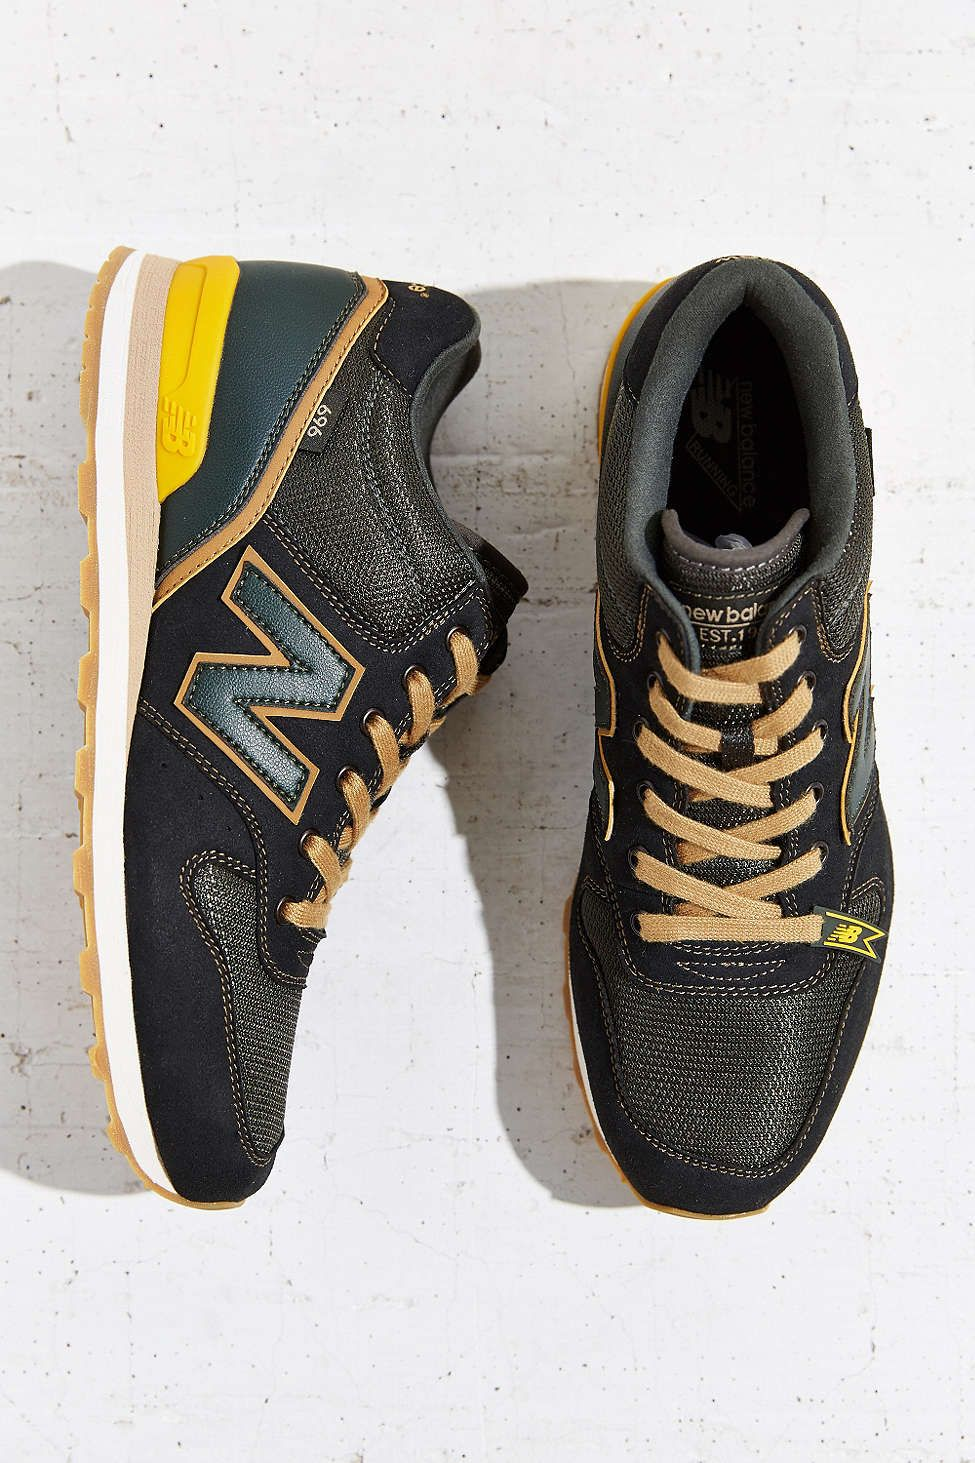 New Balance 696 Classic Suede Sneaker GpoLFR